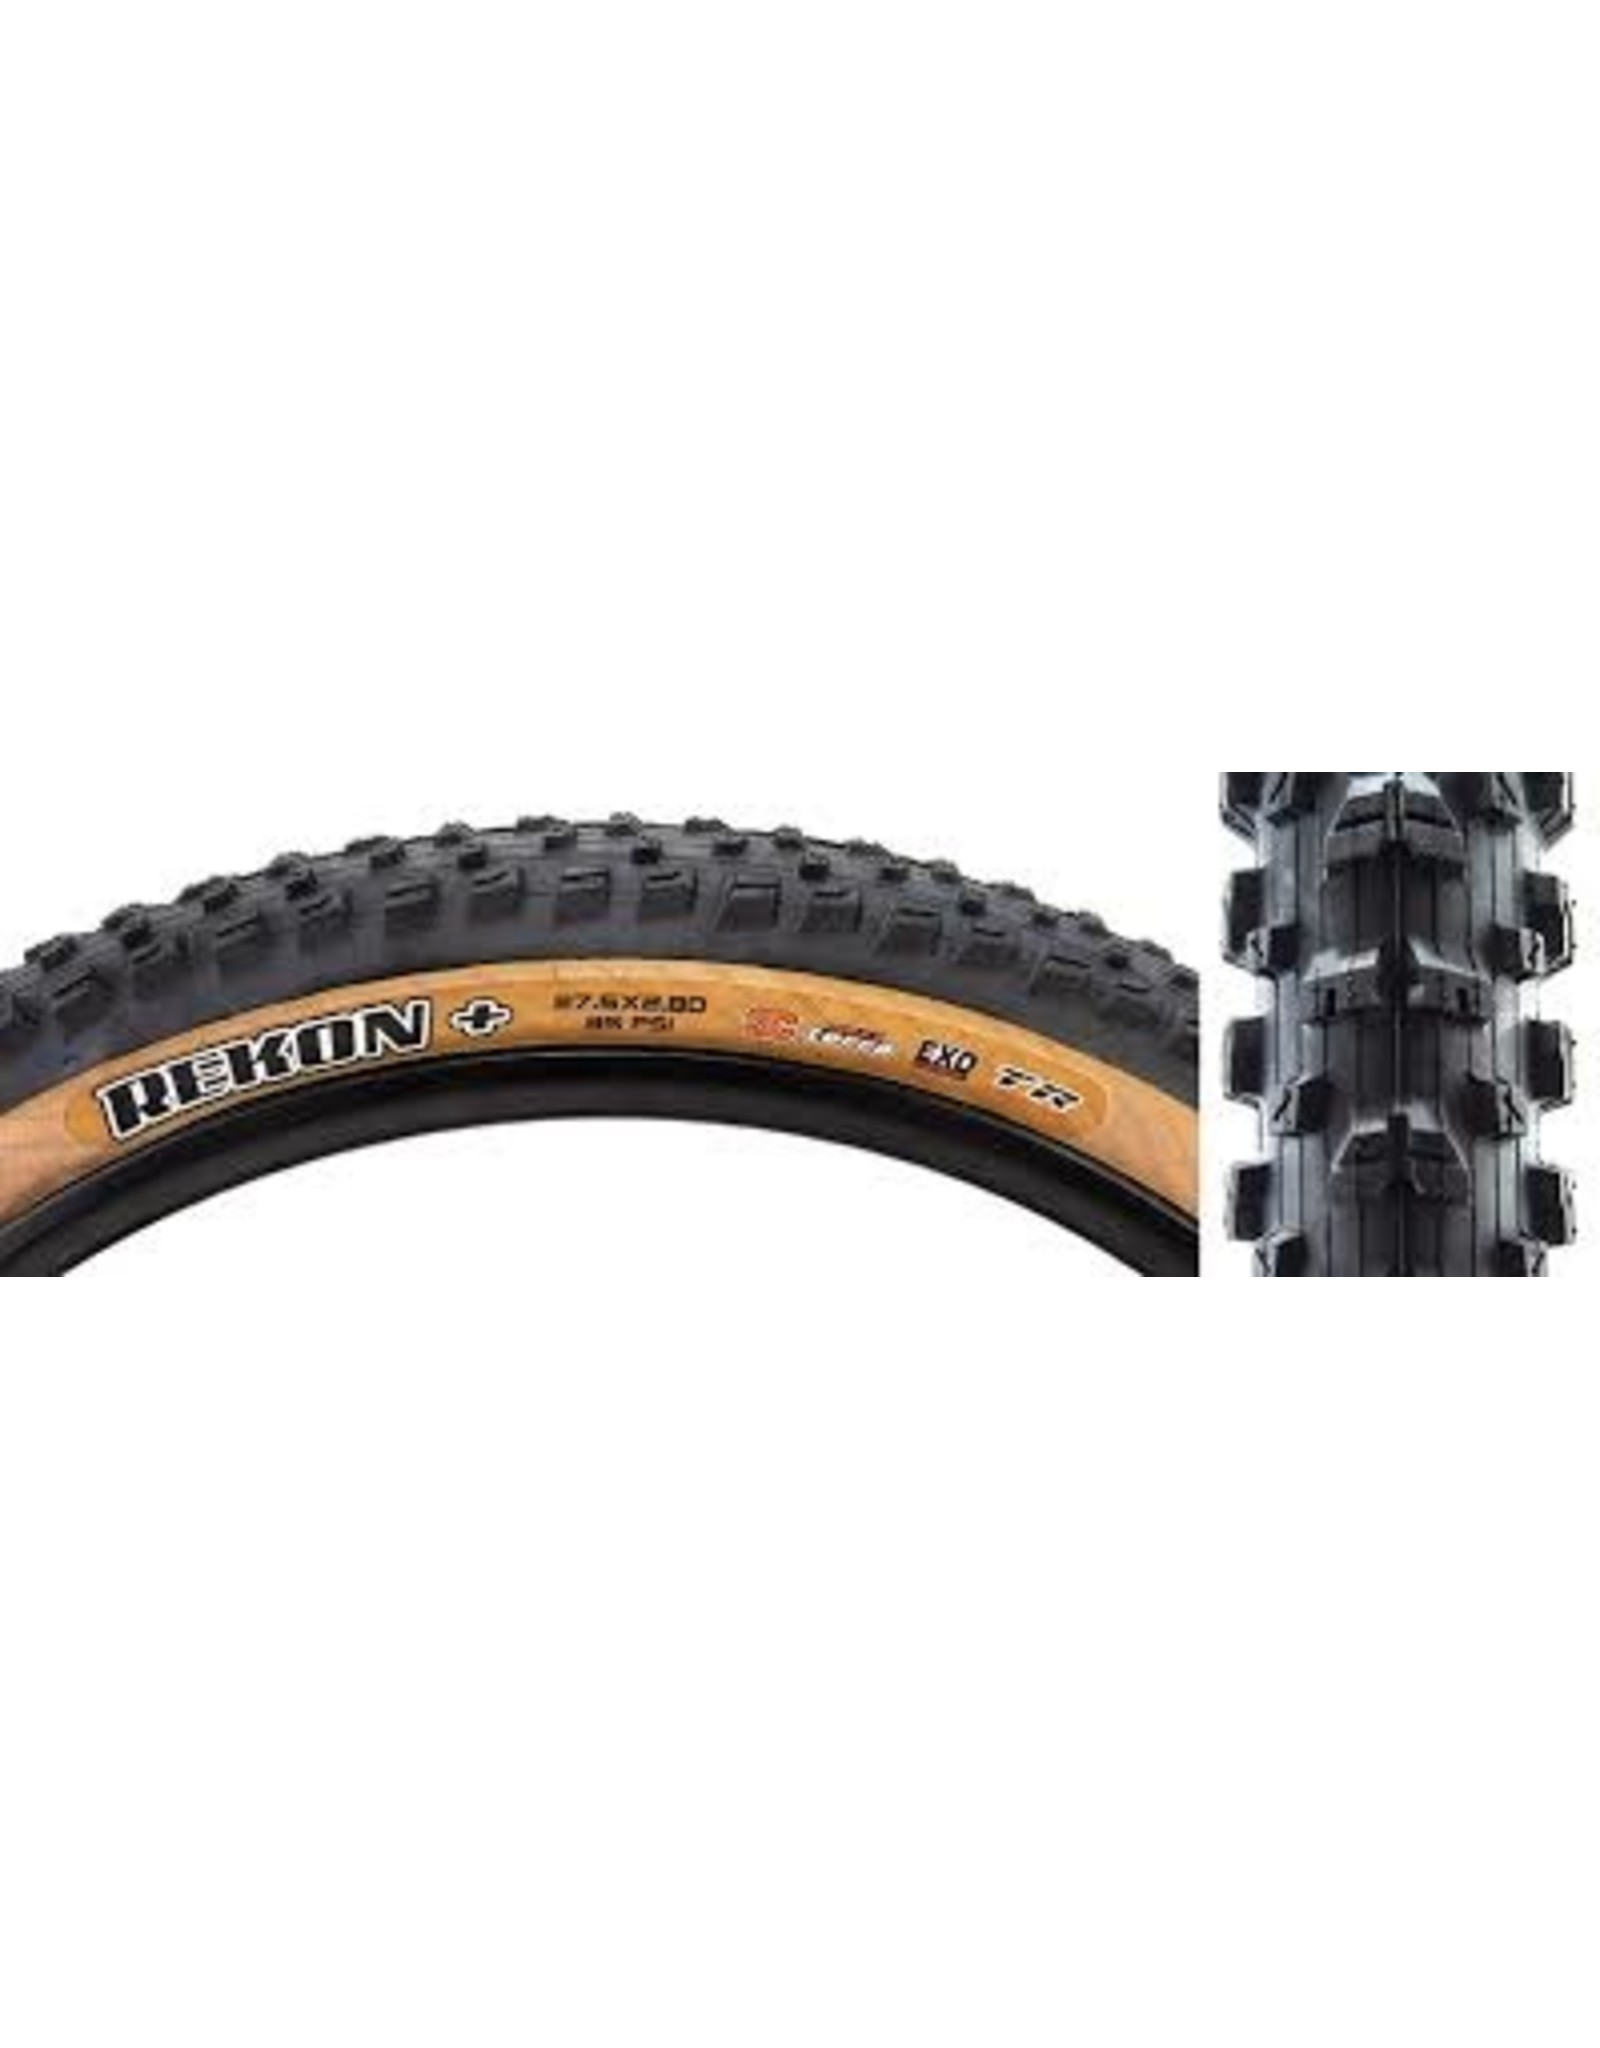 Maxxis Rekon Plus Tire - 27.5 x 2.8, Tubeless, Folding, Black/Tan, 3C Maxx Terra, EXO